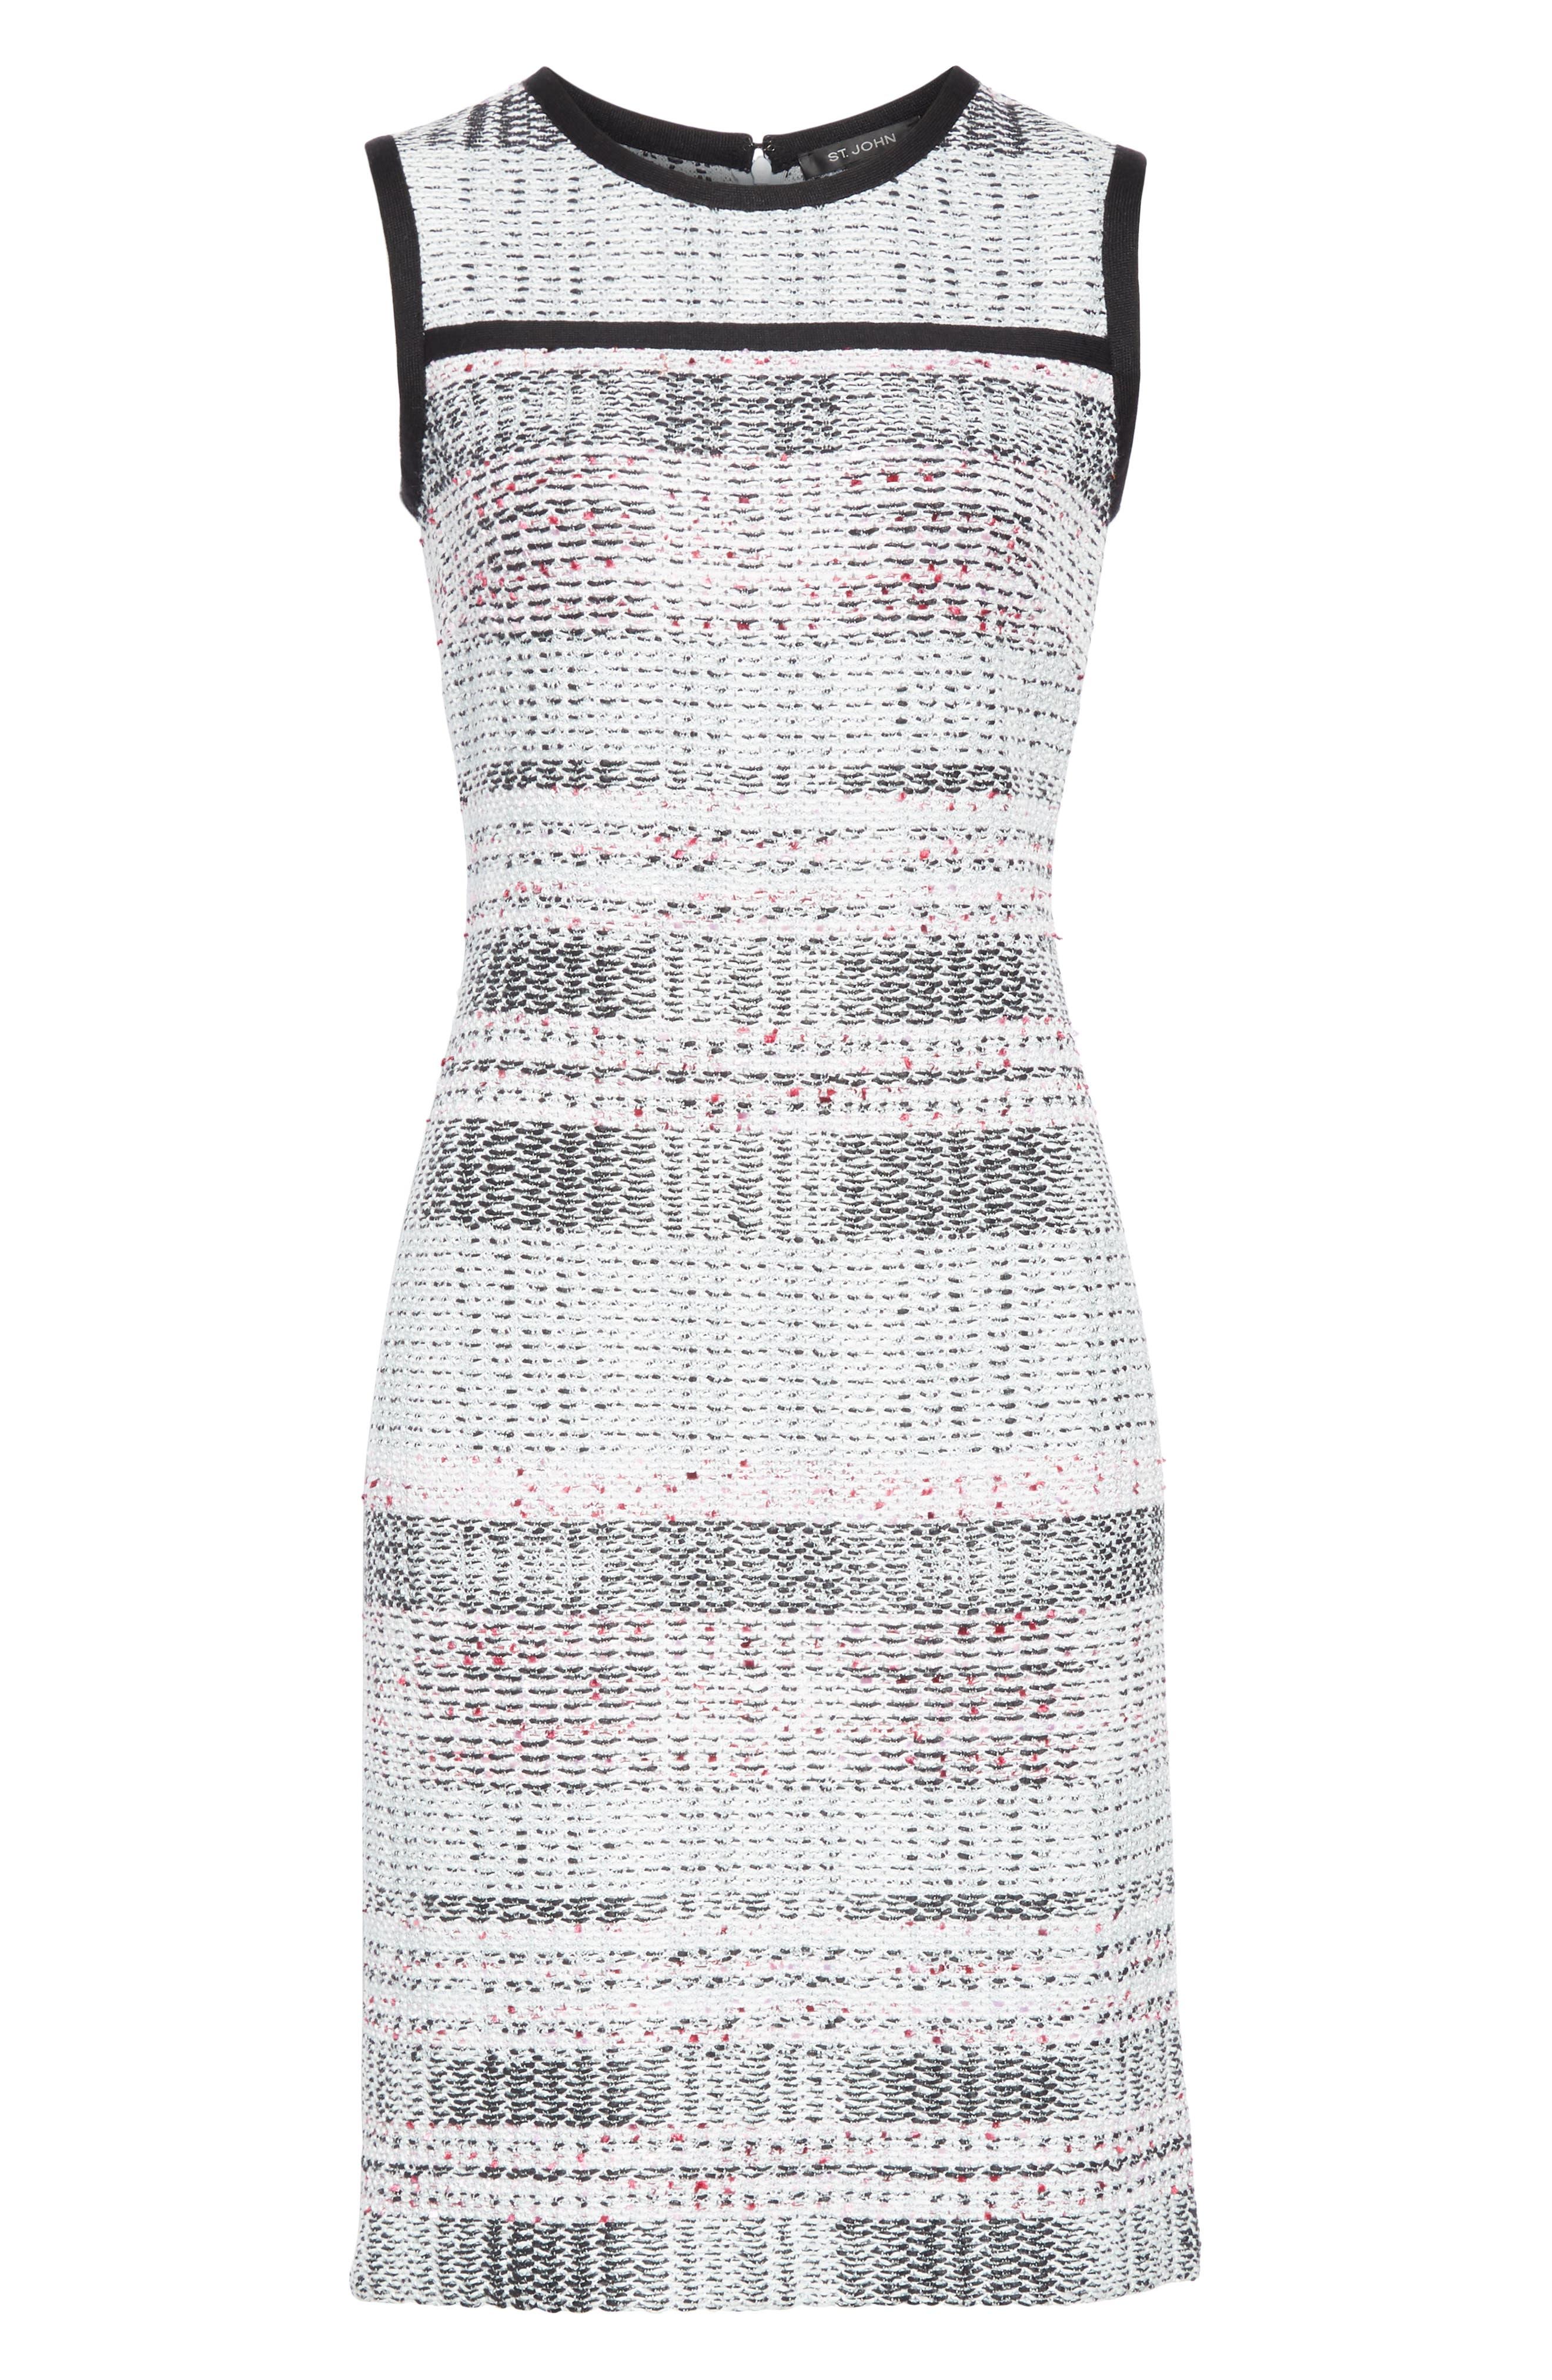 Bianca Plaid Knit Sheath Dress,                             Alternate thumbnail 7, color,                             GREY MULTI